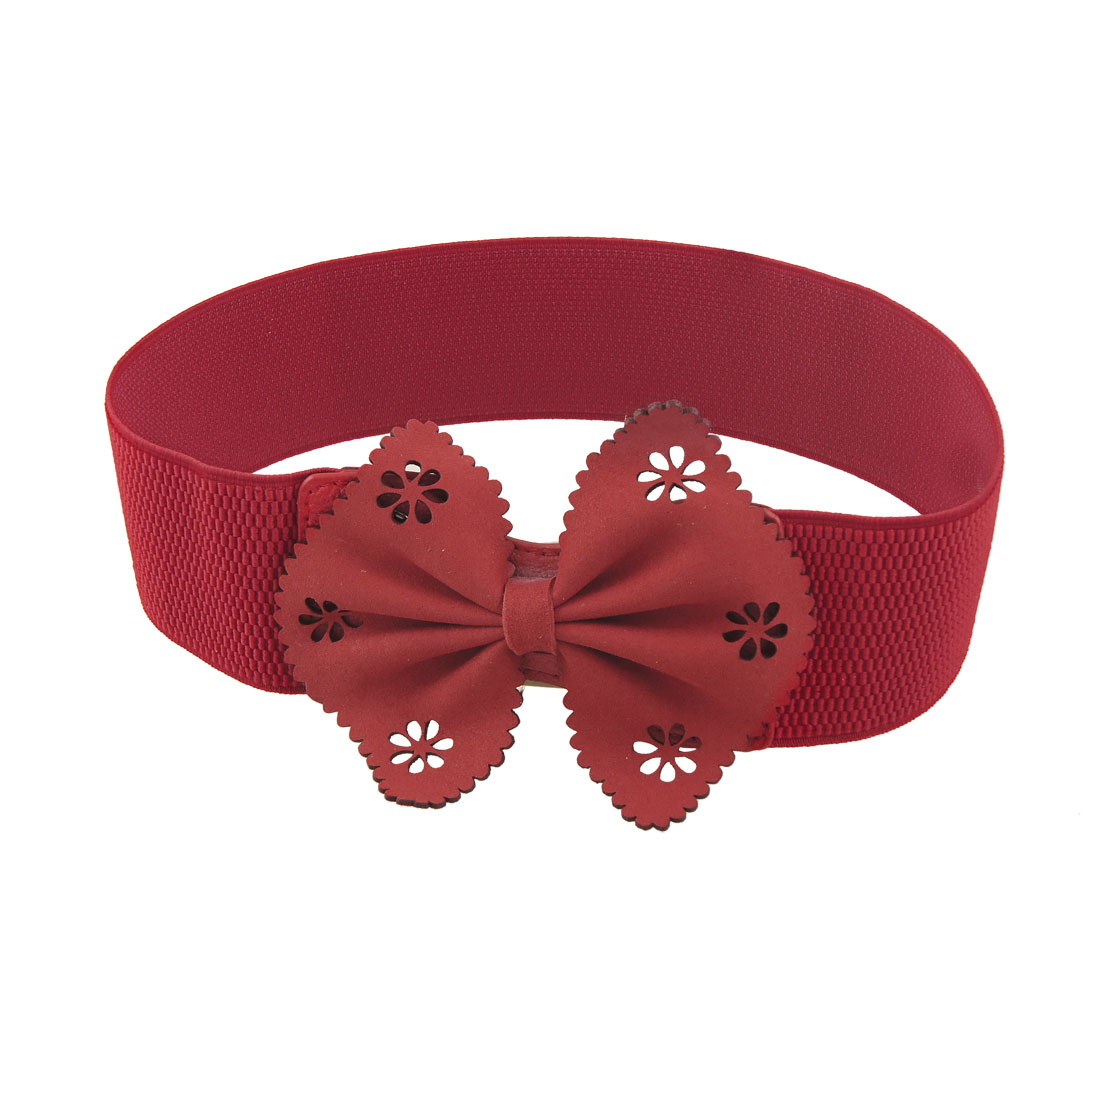 Lady Bowknot Decor Press Button Closure Red Stretchy Waist Belt